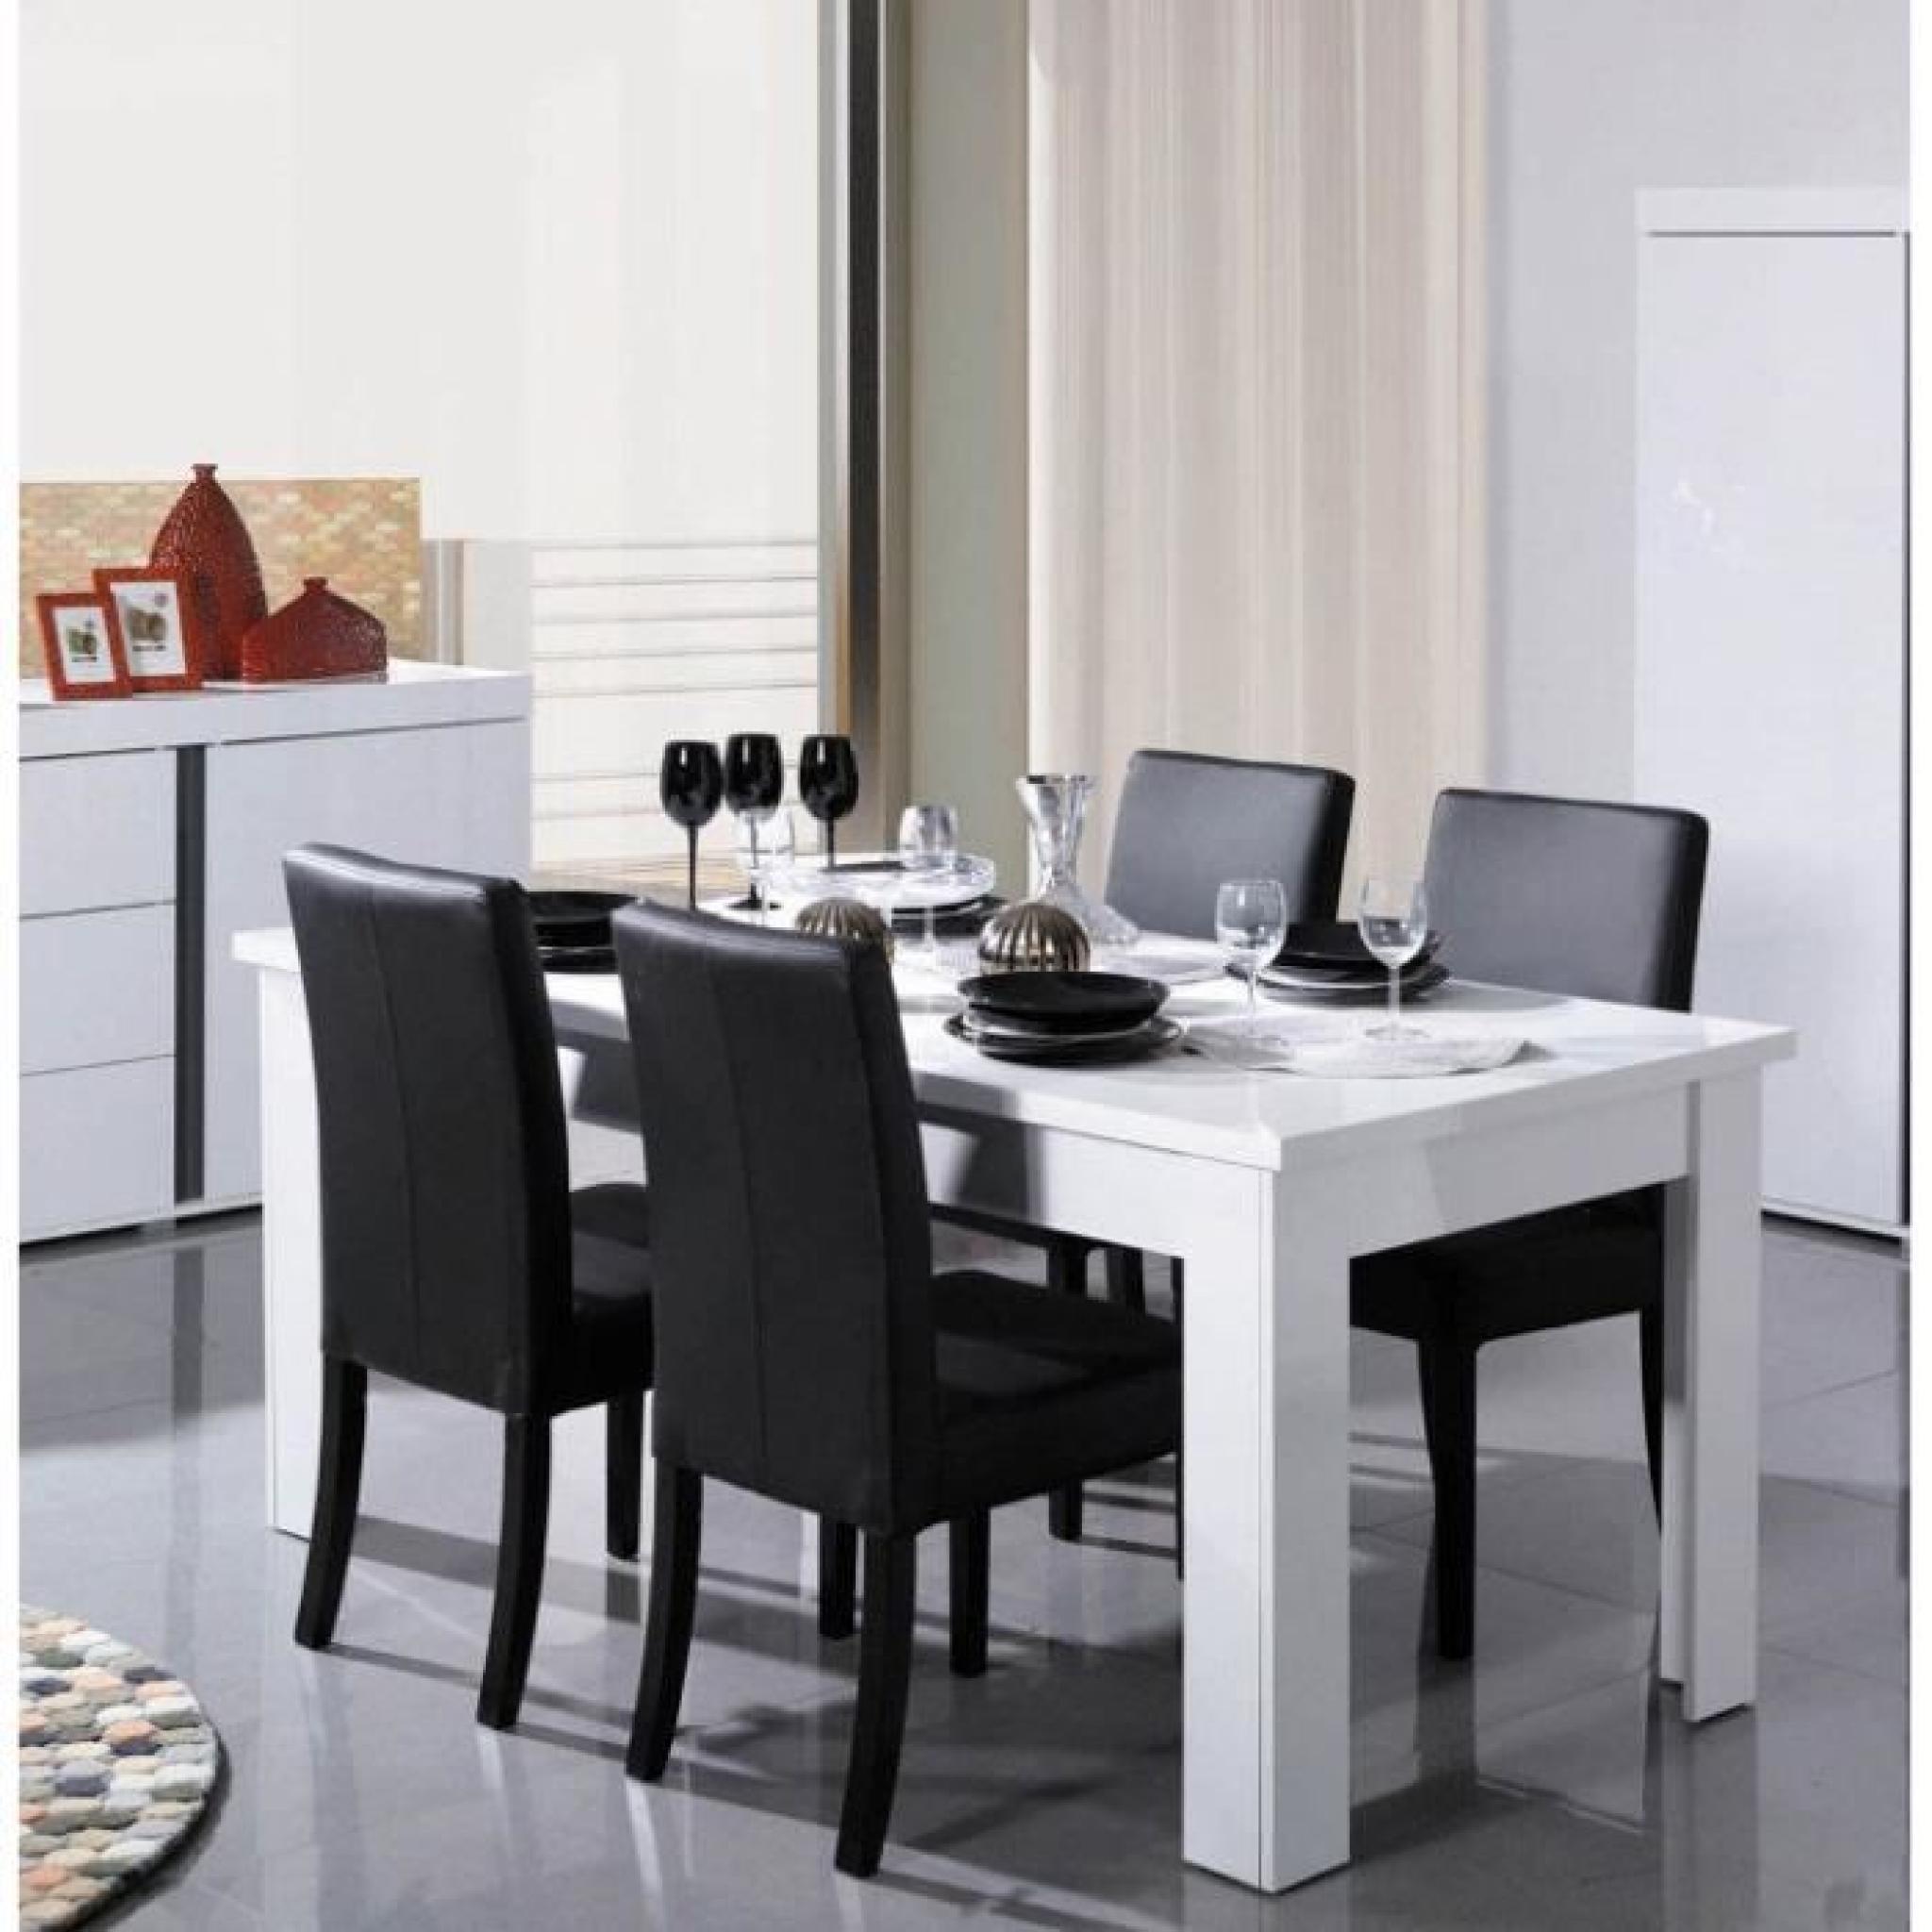 Table manger blanc laqu design novella l 180 cm achat for Table a manger blanc laque pas cher